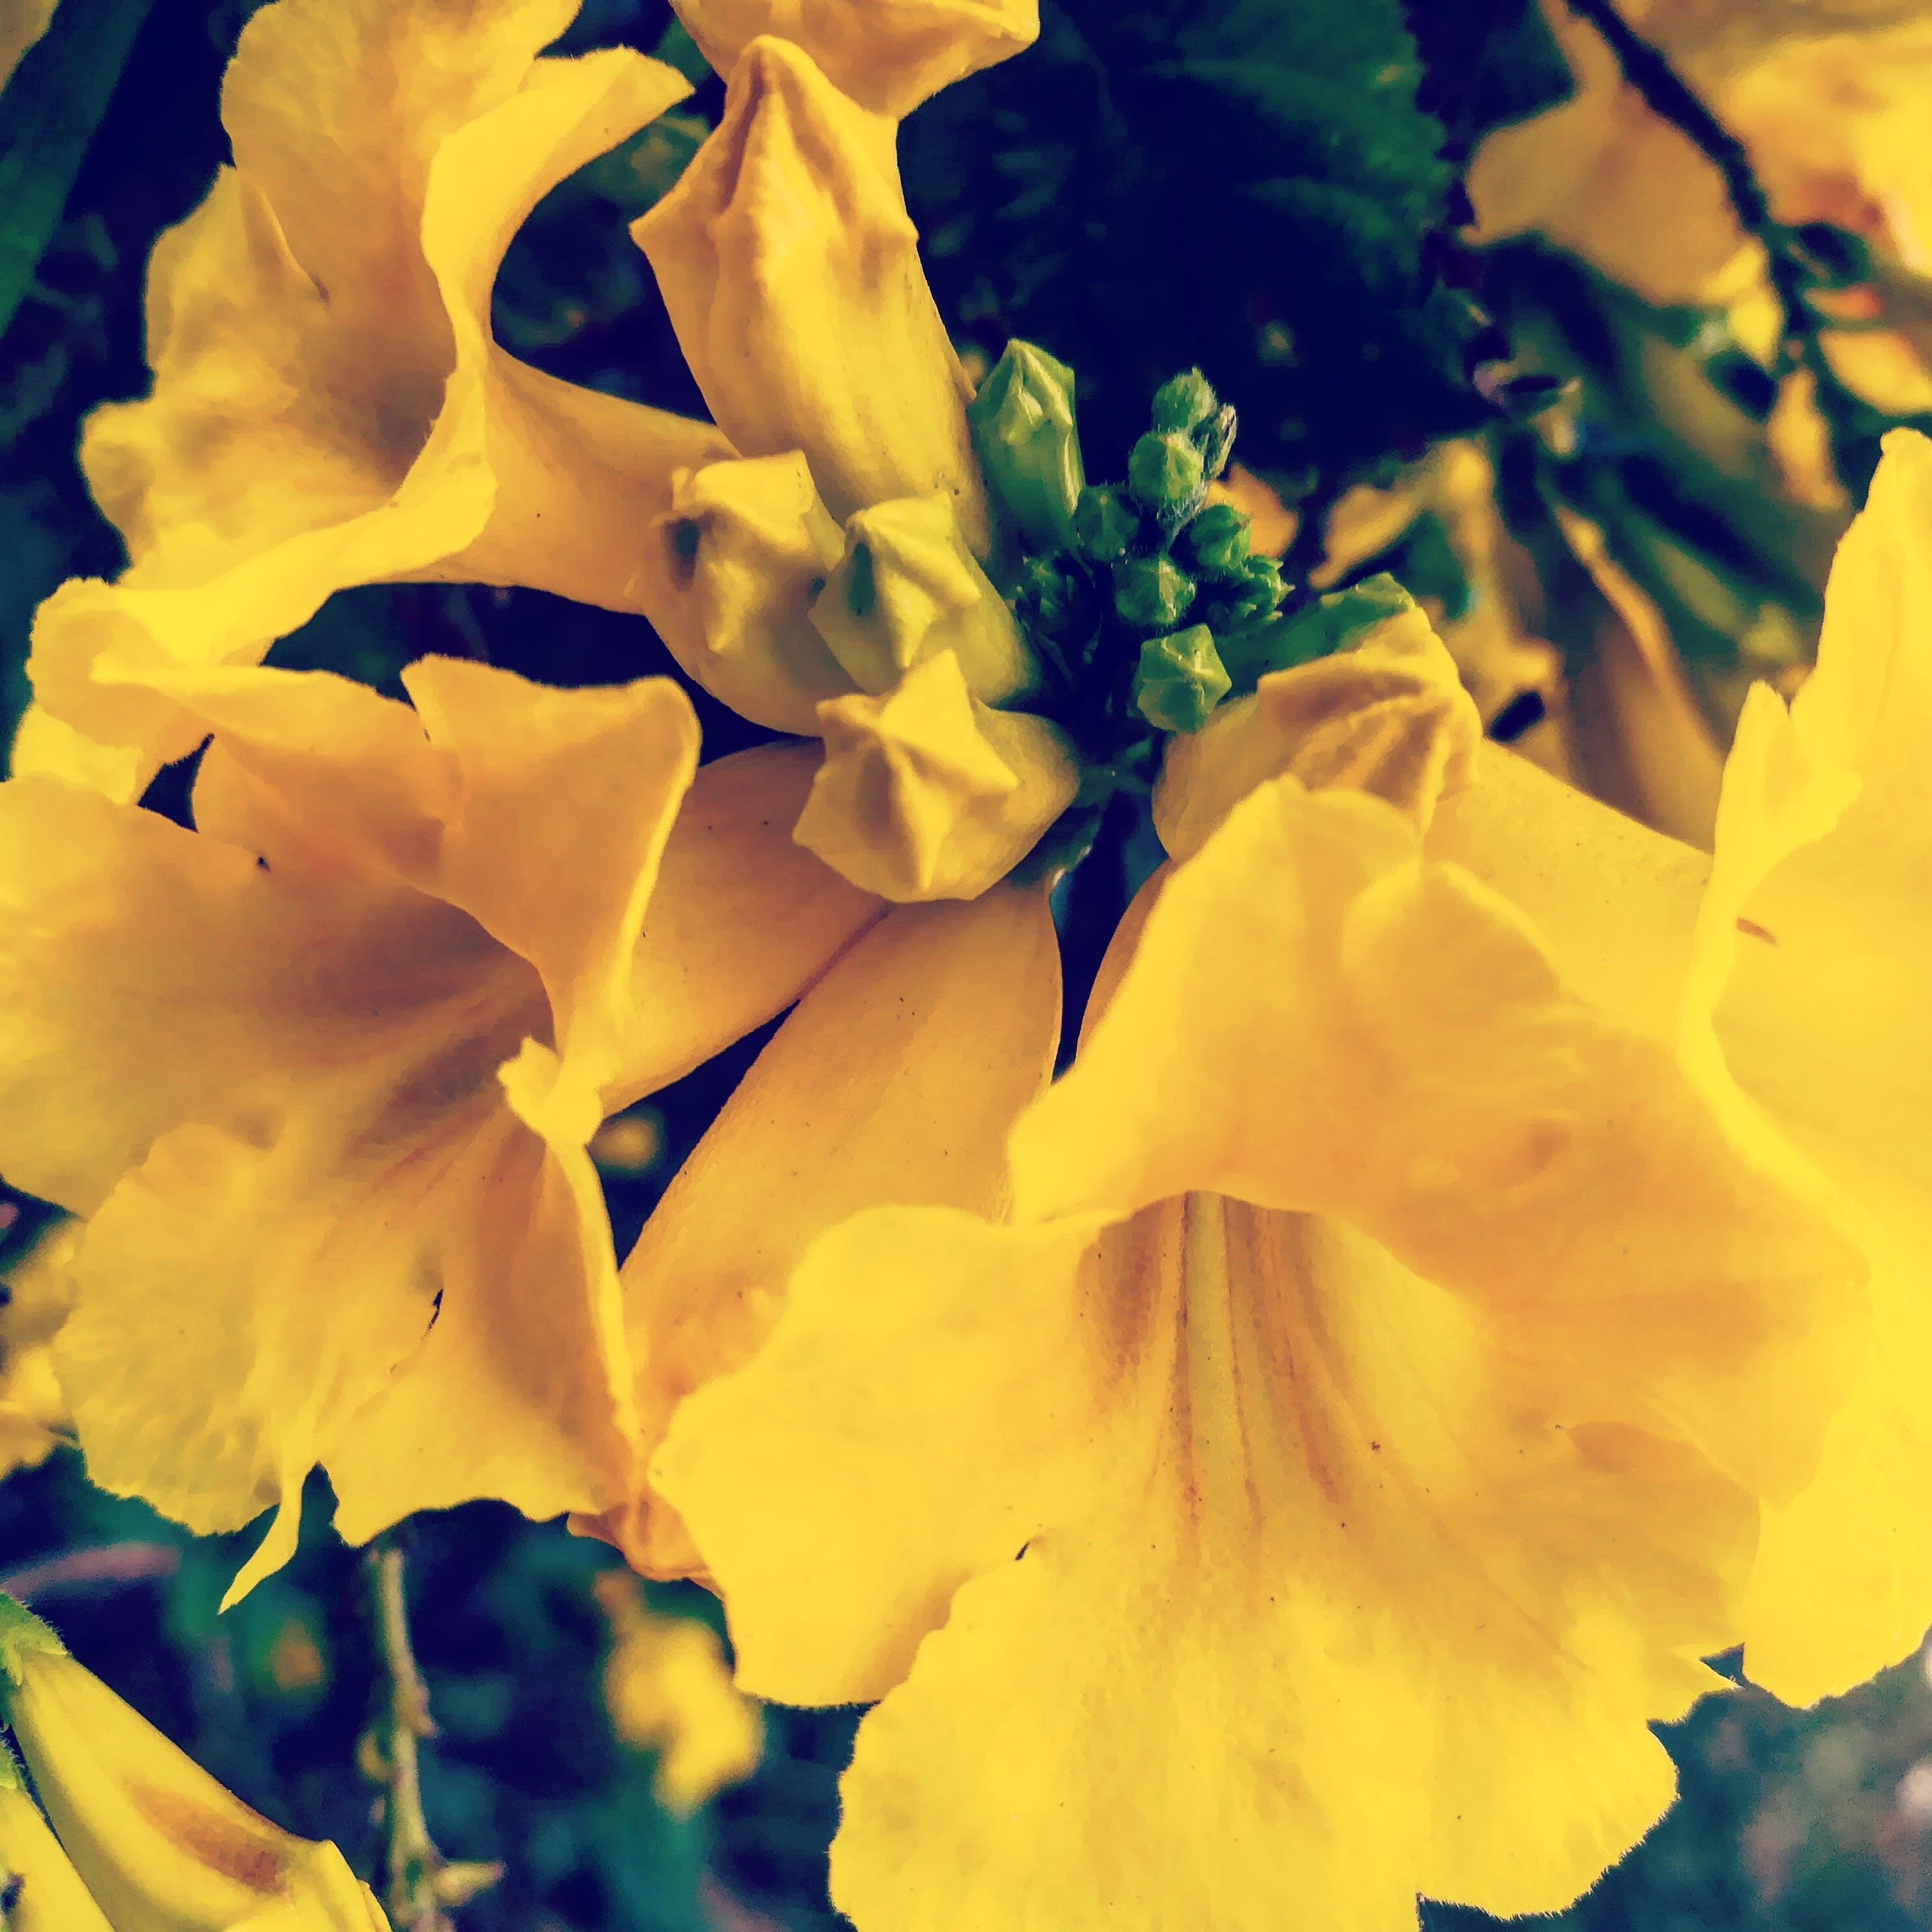 Free stock photo of beautiful flowers, yellow, yellow flowers